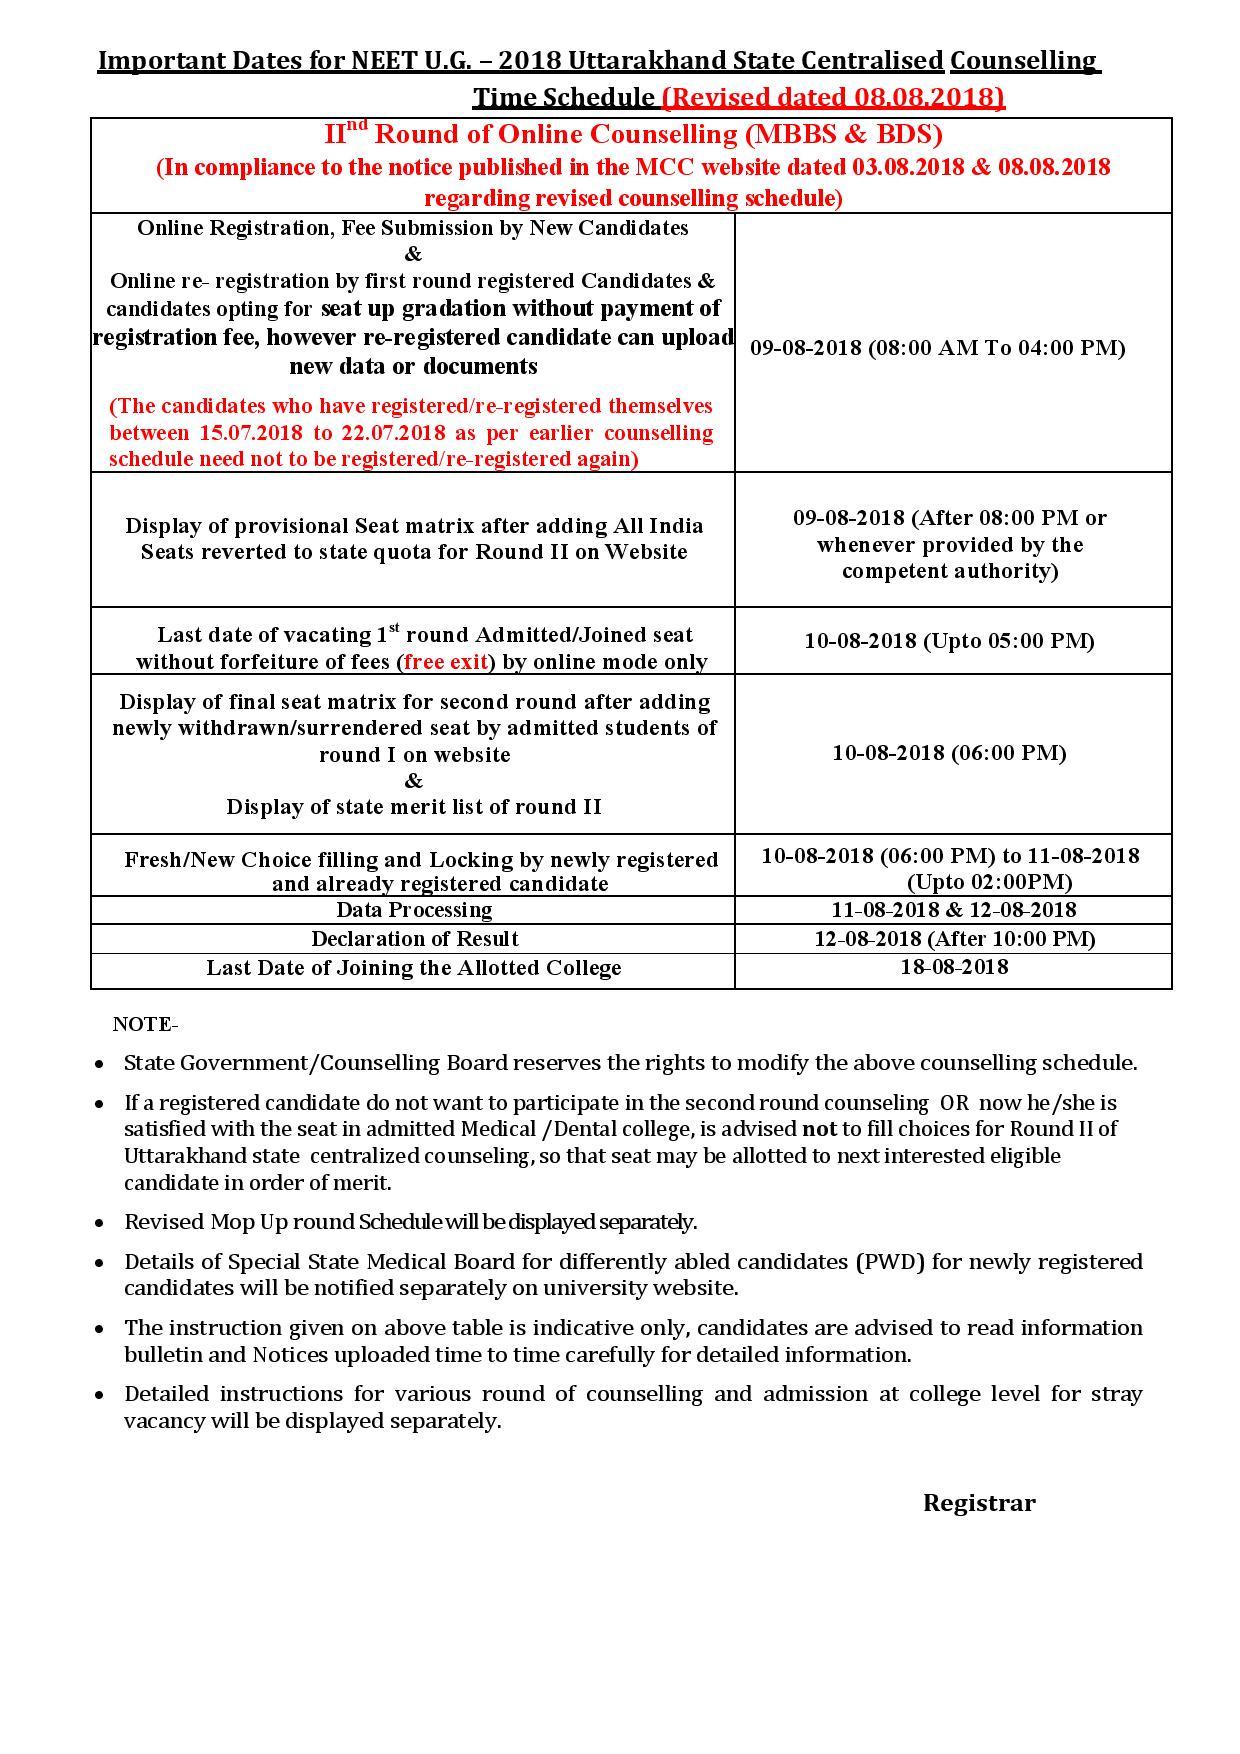 Uttarakhand neet counseling dates